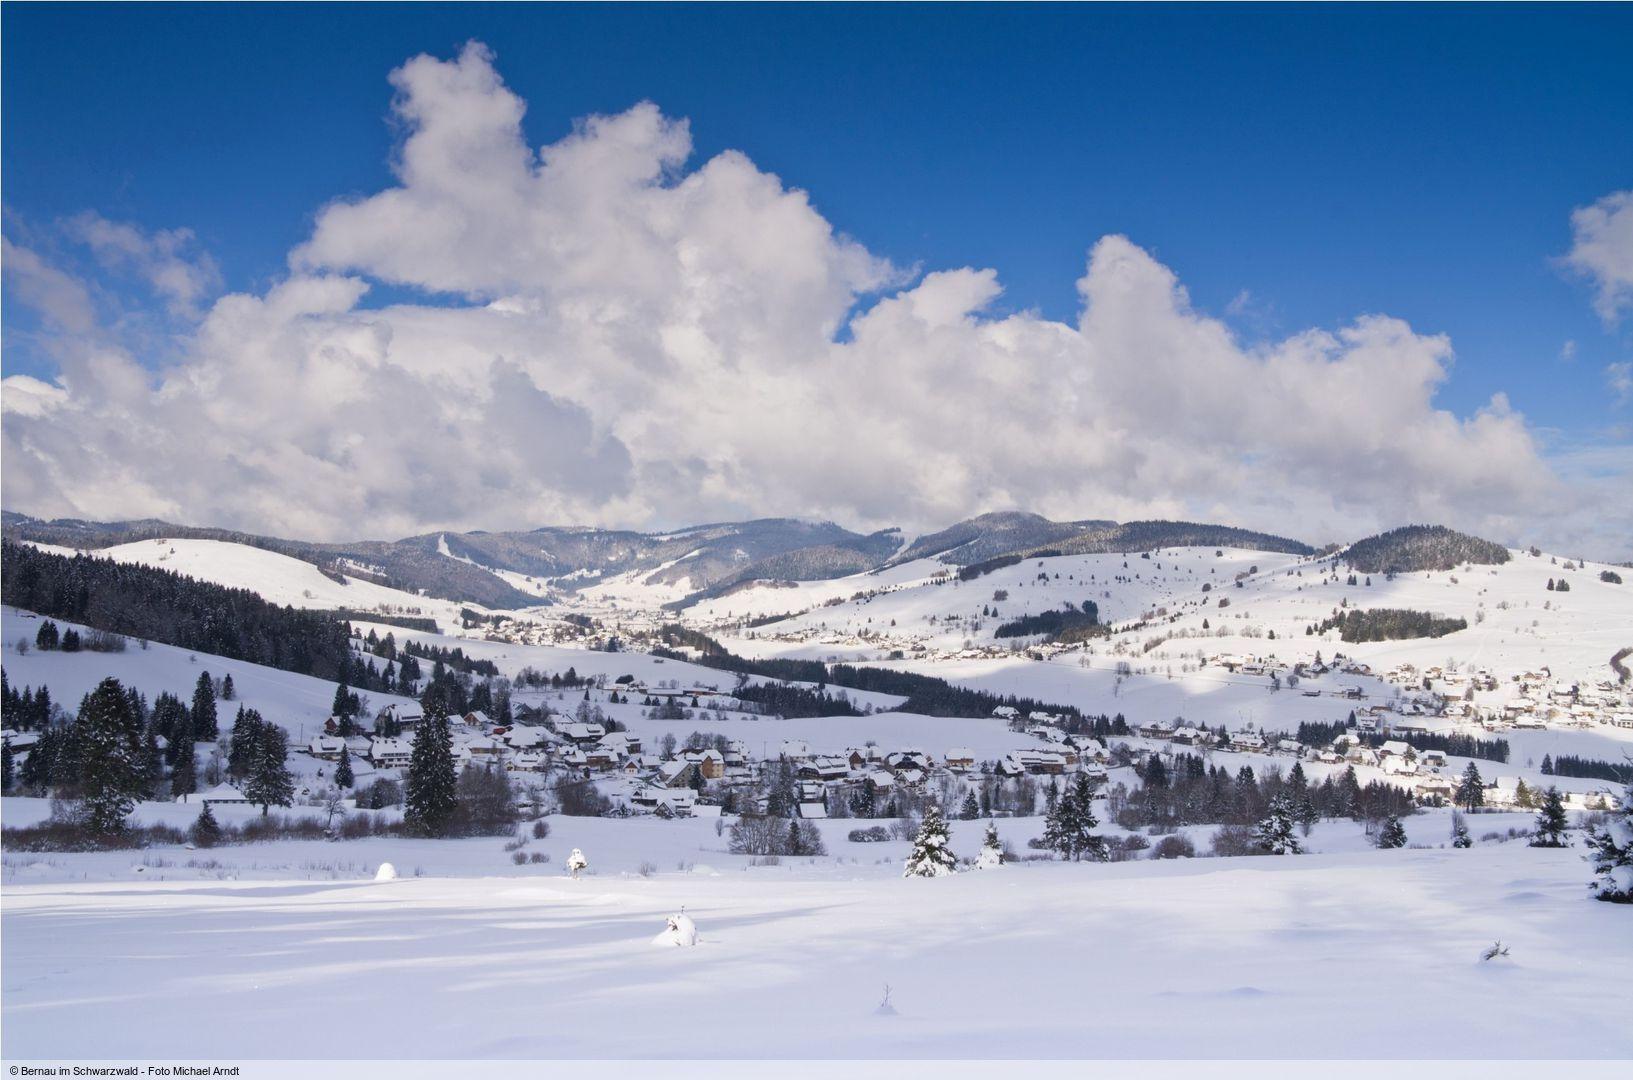 wintersport en aanbiedingen in Bernau in het Zwarte Woud